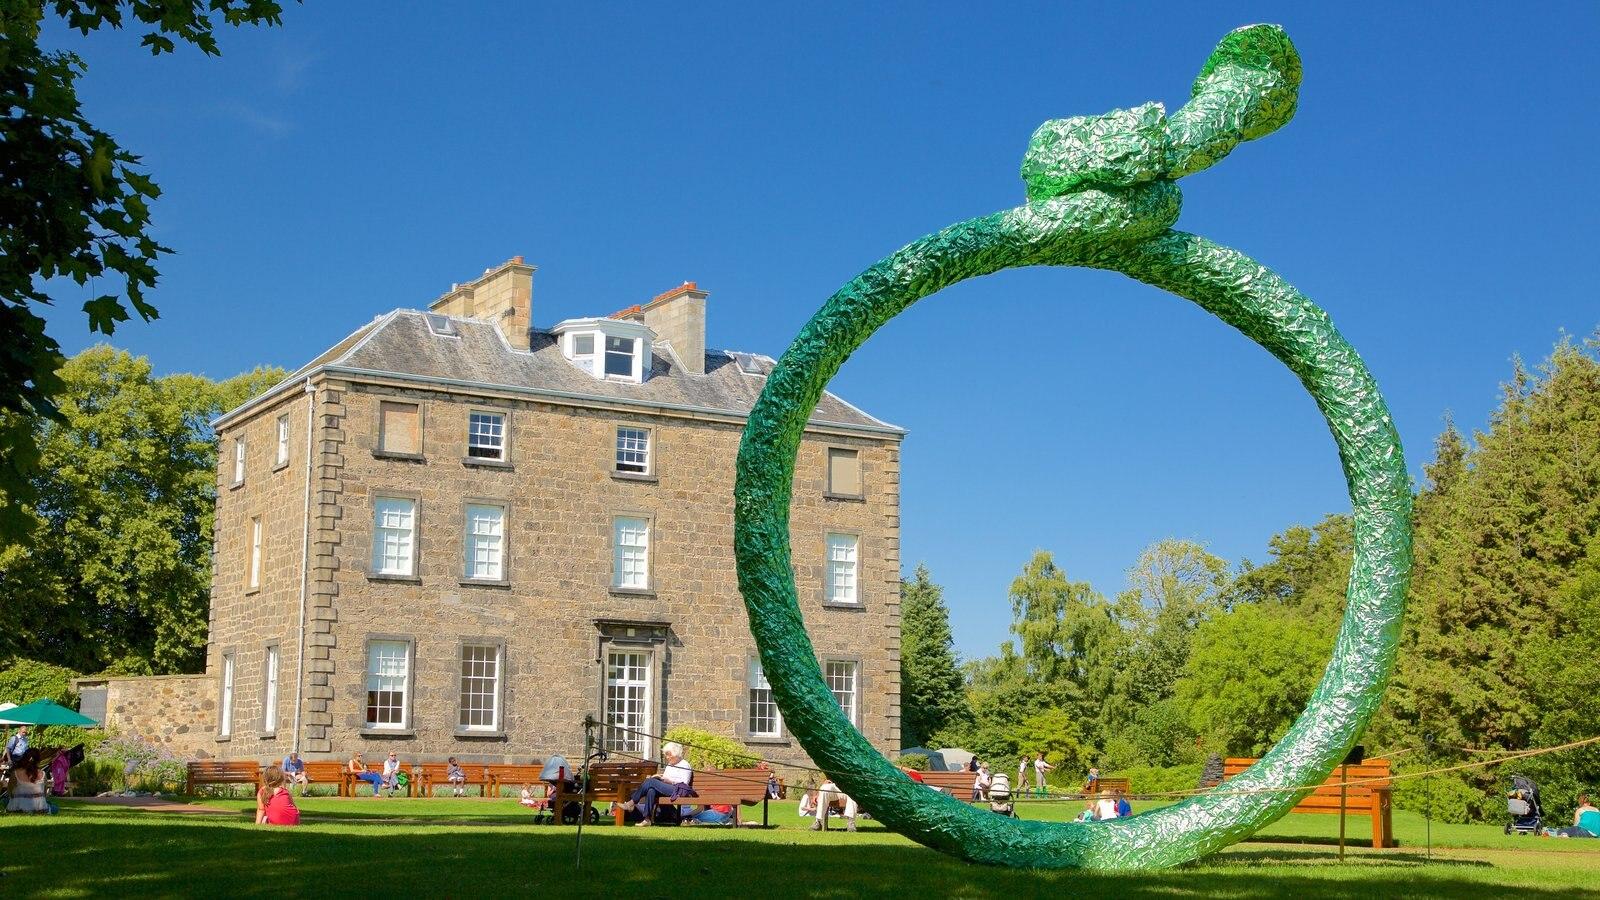 Royal Botanic Garden showing a house and outdoor art